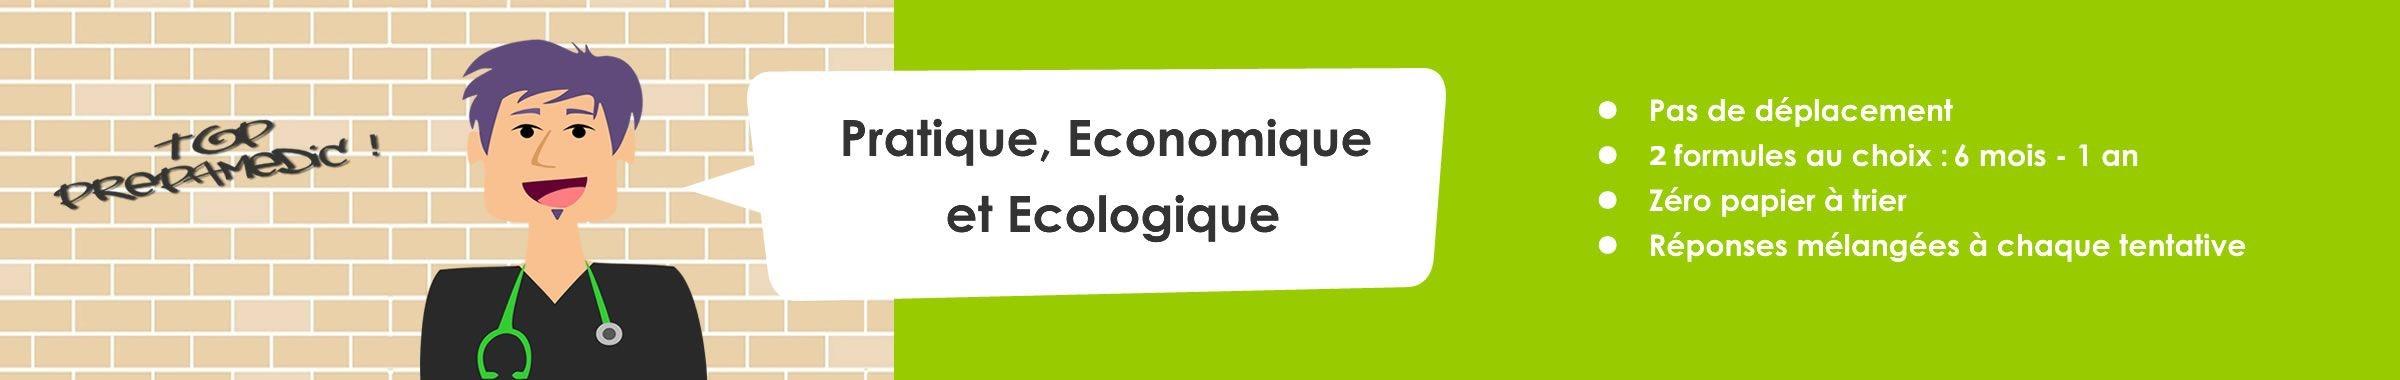 Prepamedic - Pratique, Economique, Ecologique